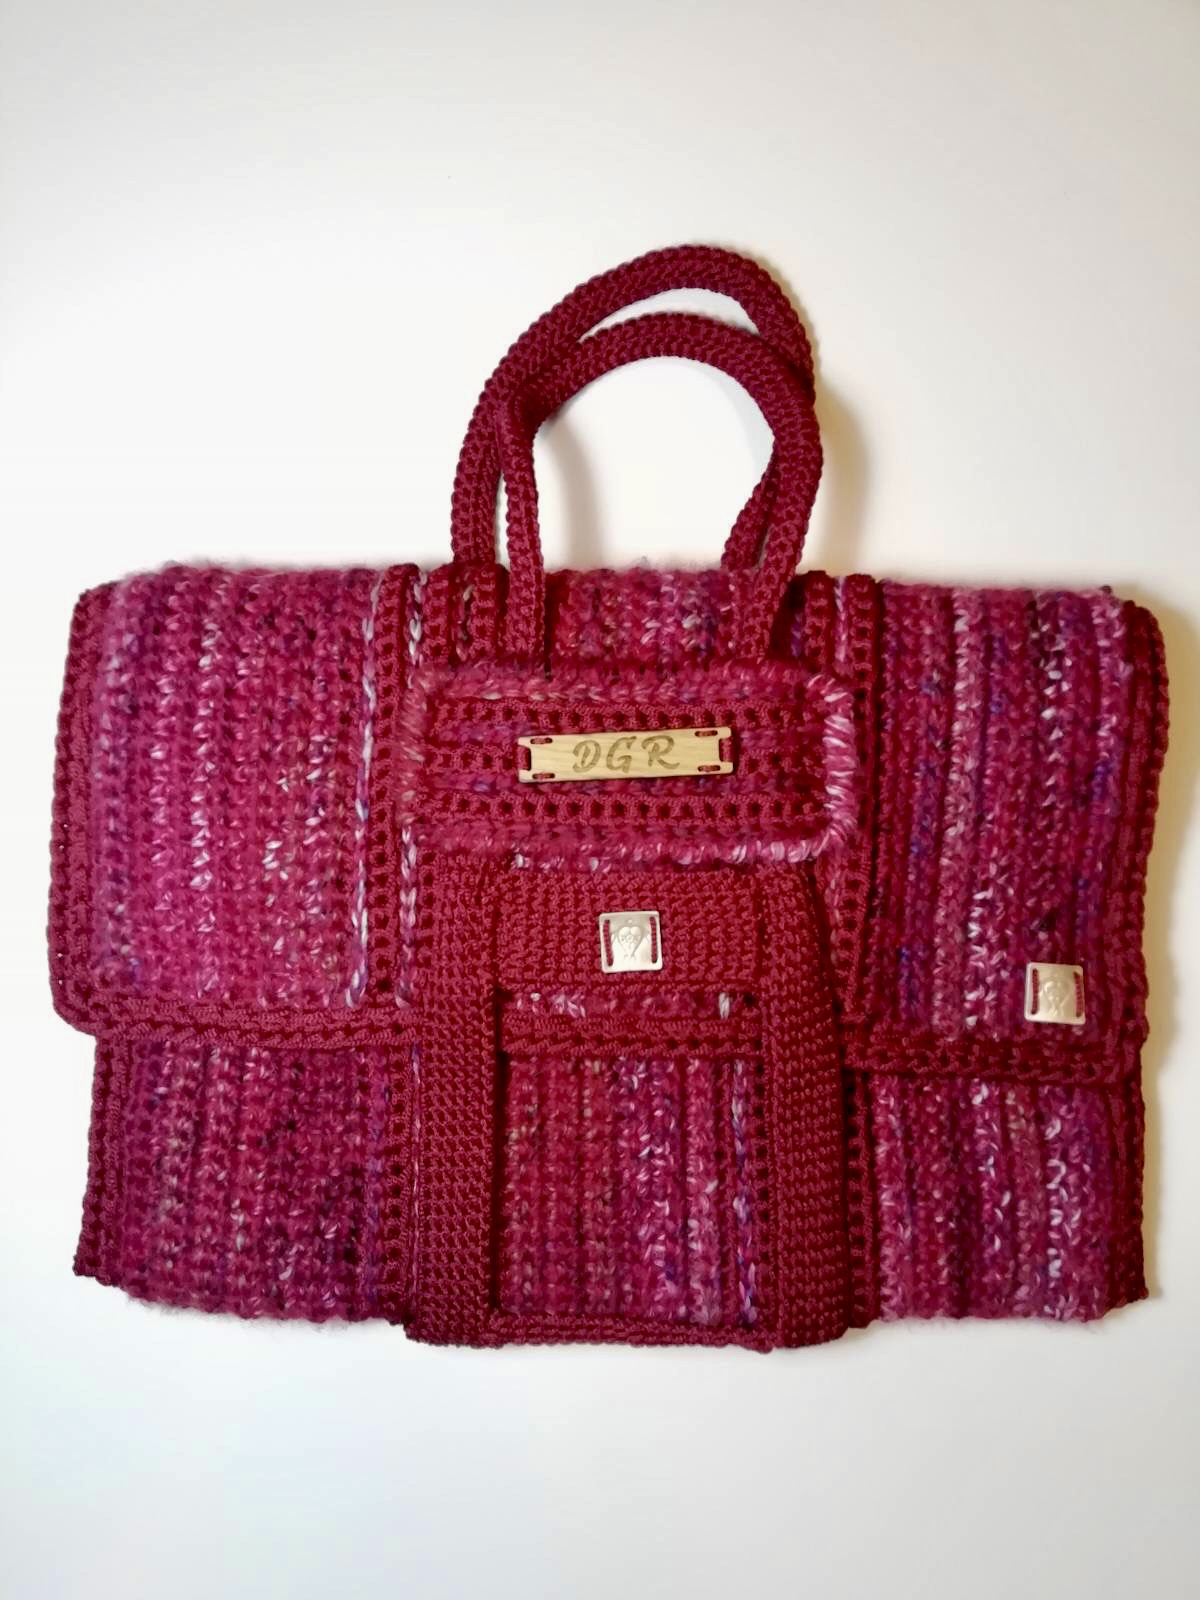 Crochet Bag in fuchsia/red